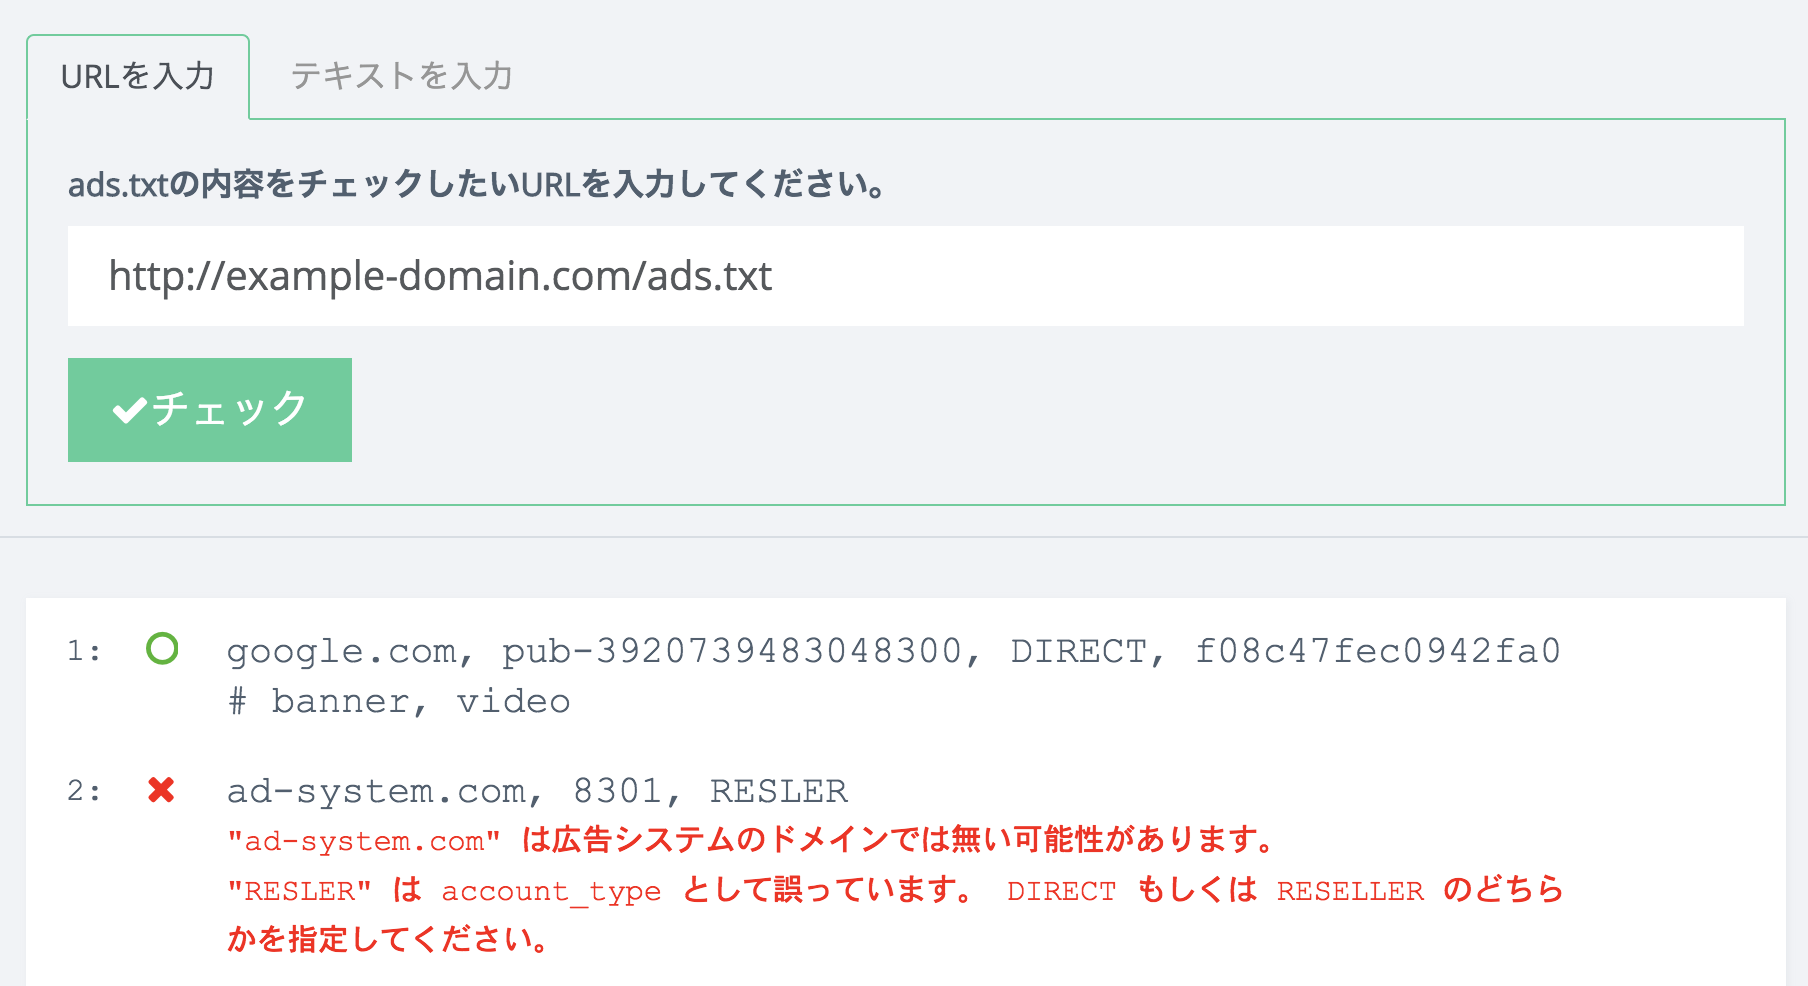 【DataSign FE(現webtru)】「Ads.txt」チェック機能